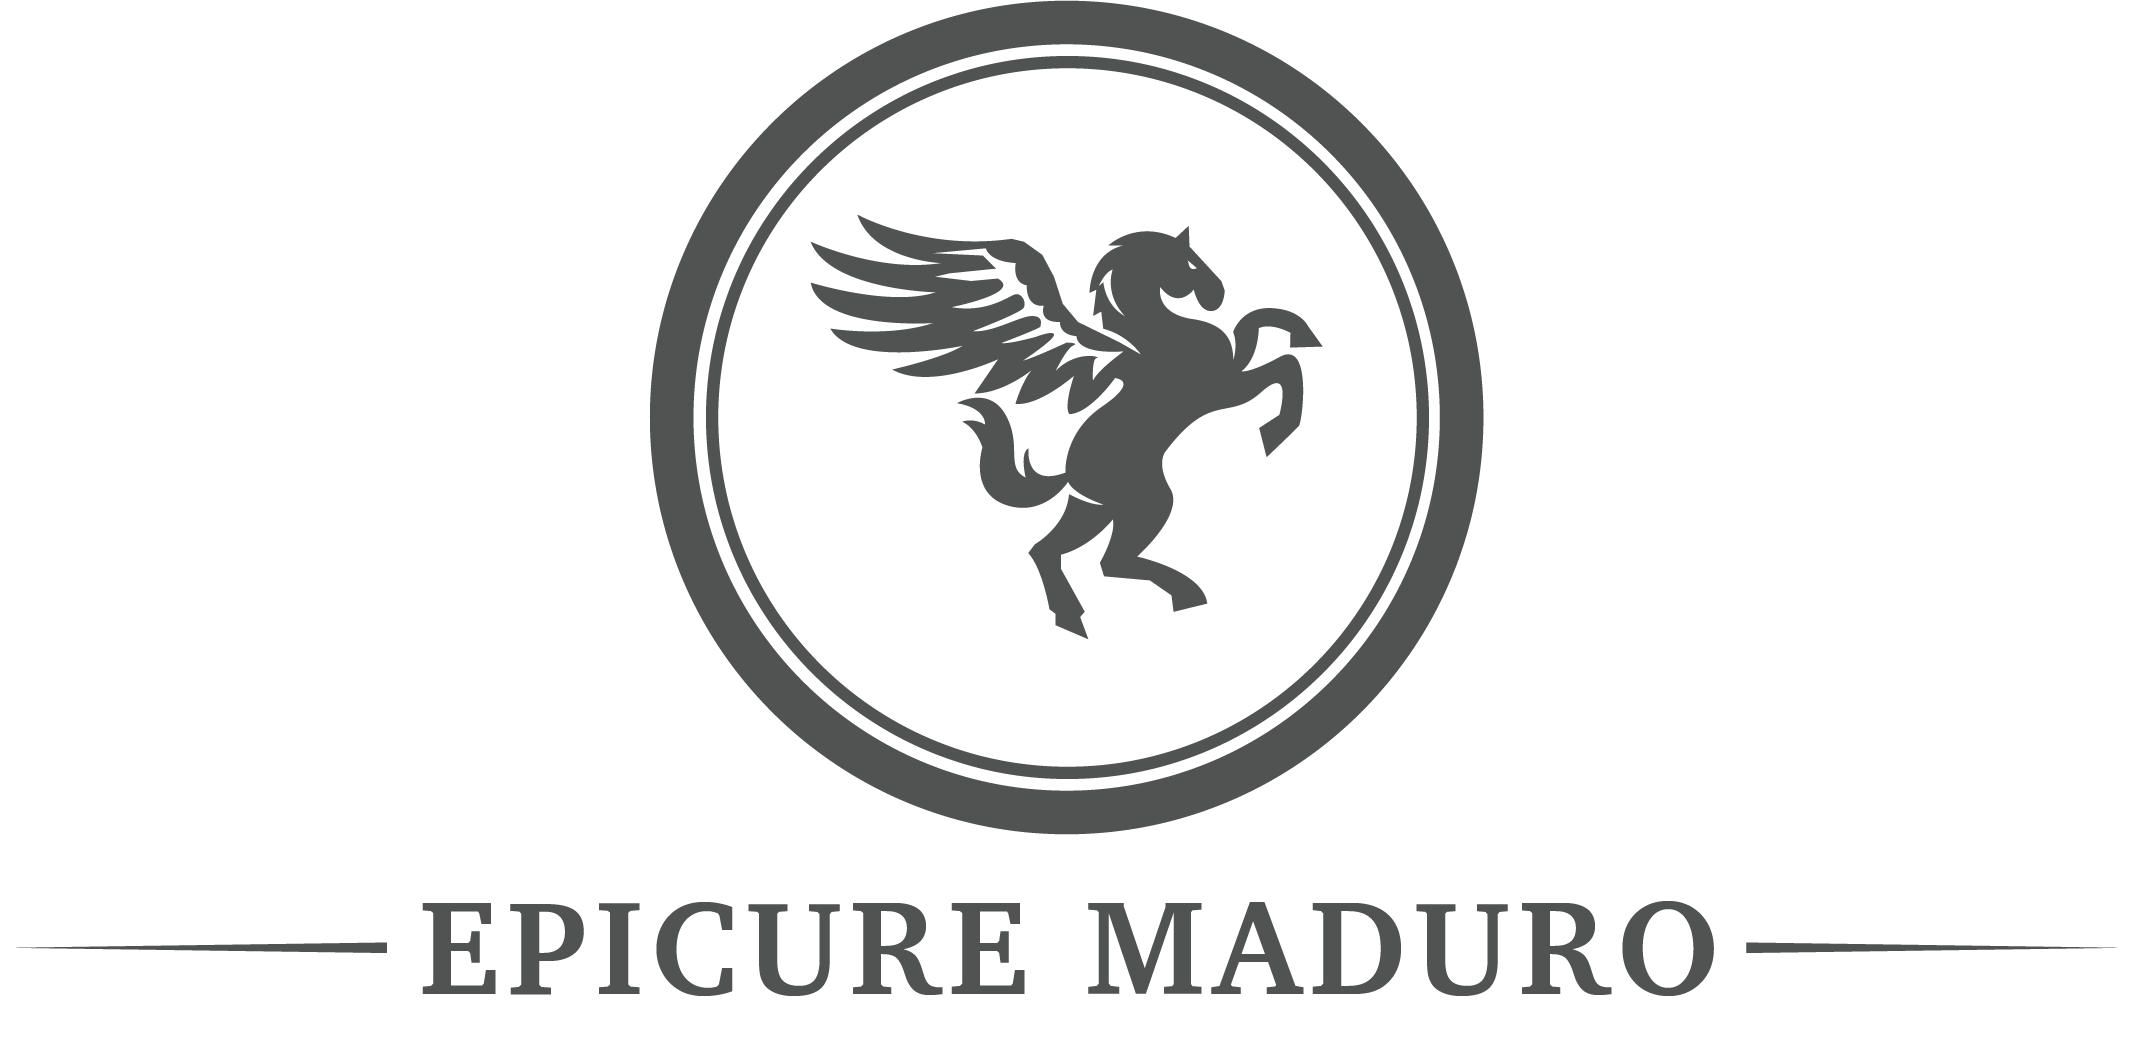 Epicure Maduro brand logo